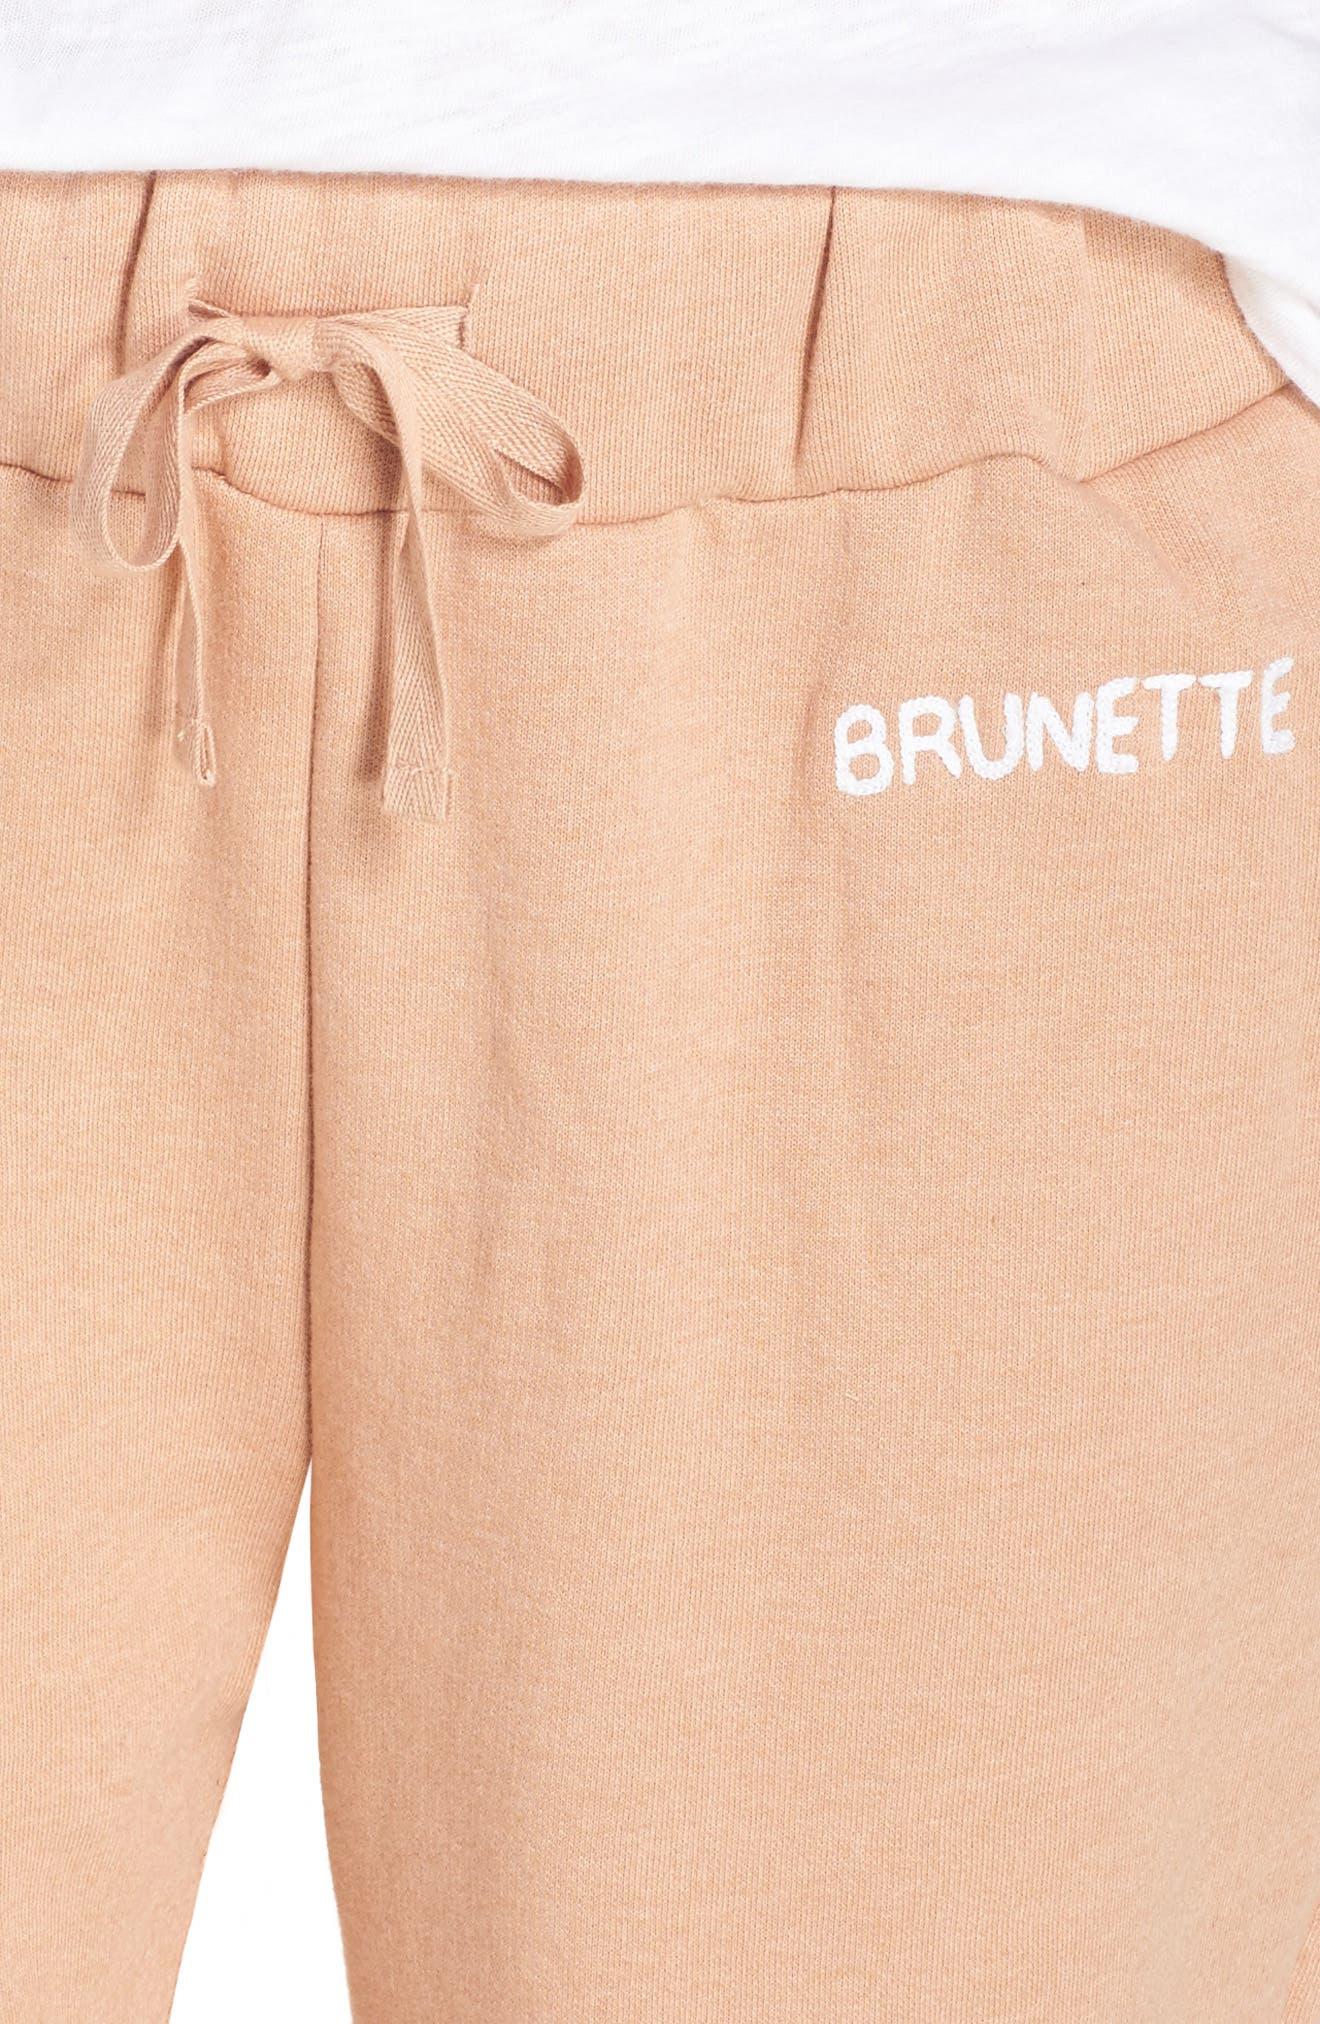 Brunette Jogger Pants,                             Alternate thumbnail 4, color,                             Rose